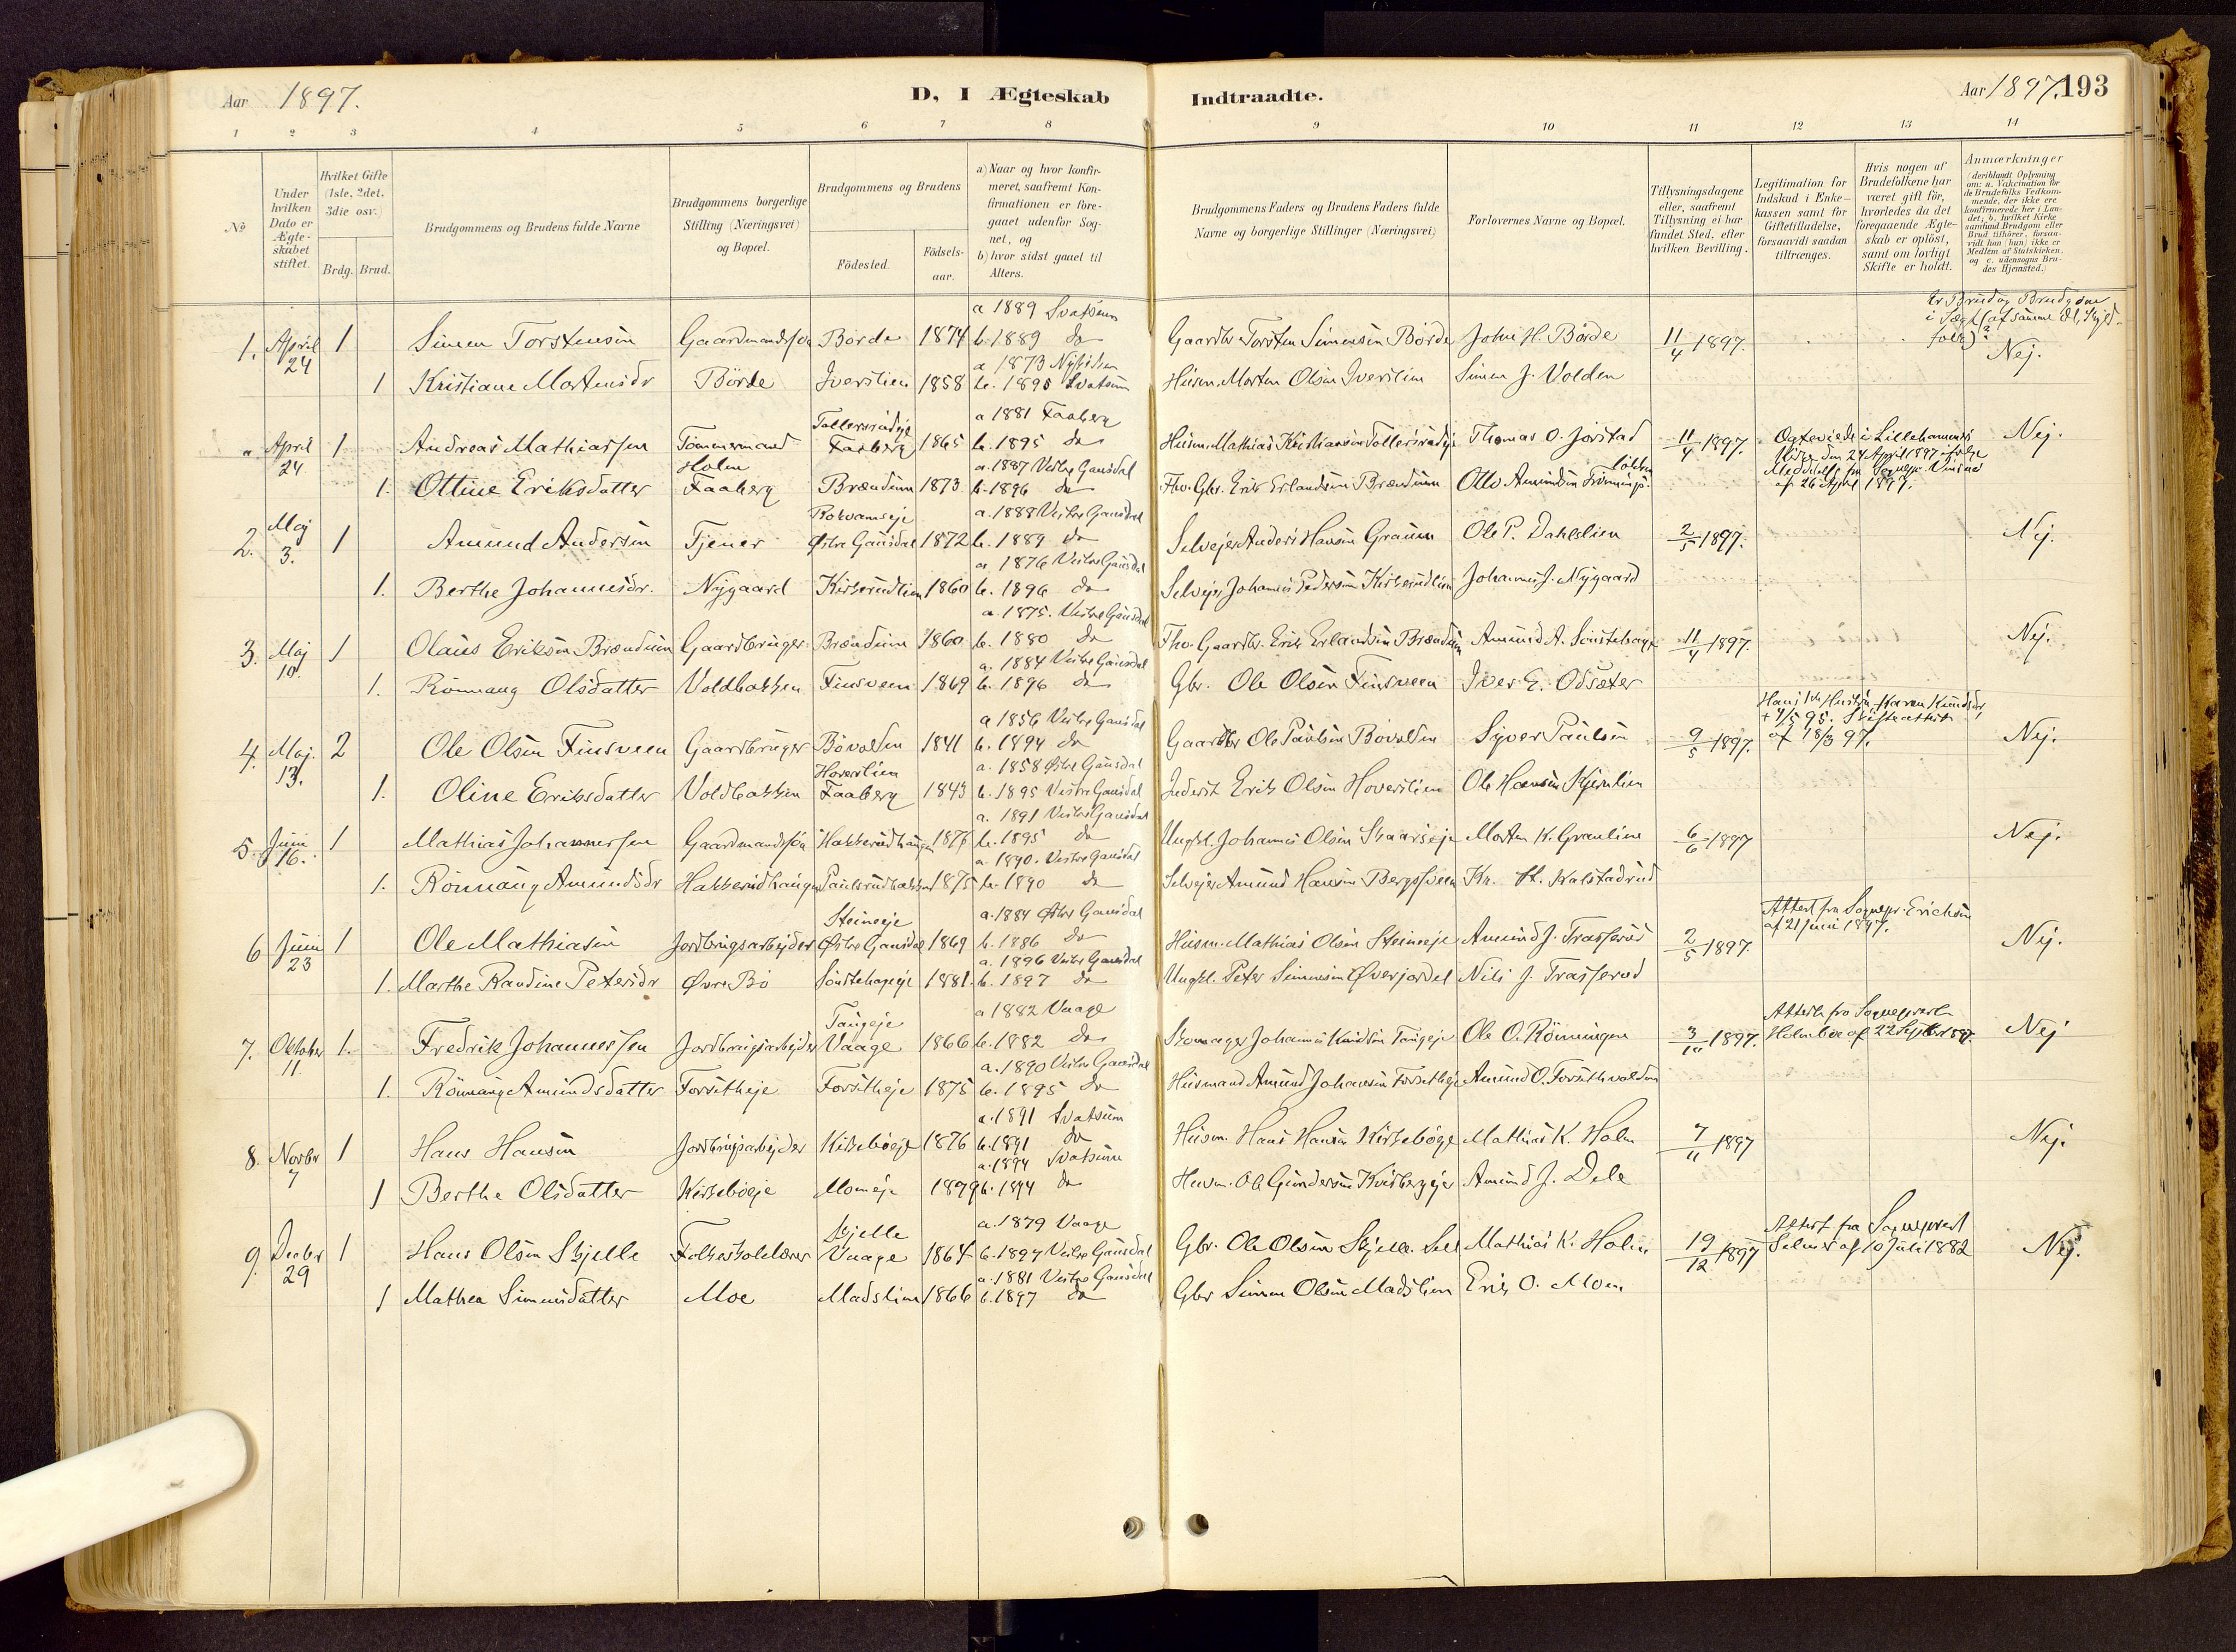 SAH, Vestre Gausdal prestekontor, Ministerialbok nr. 1, 1887-1914, s. 193